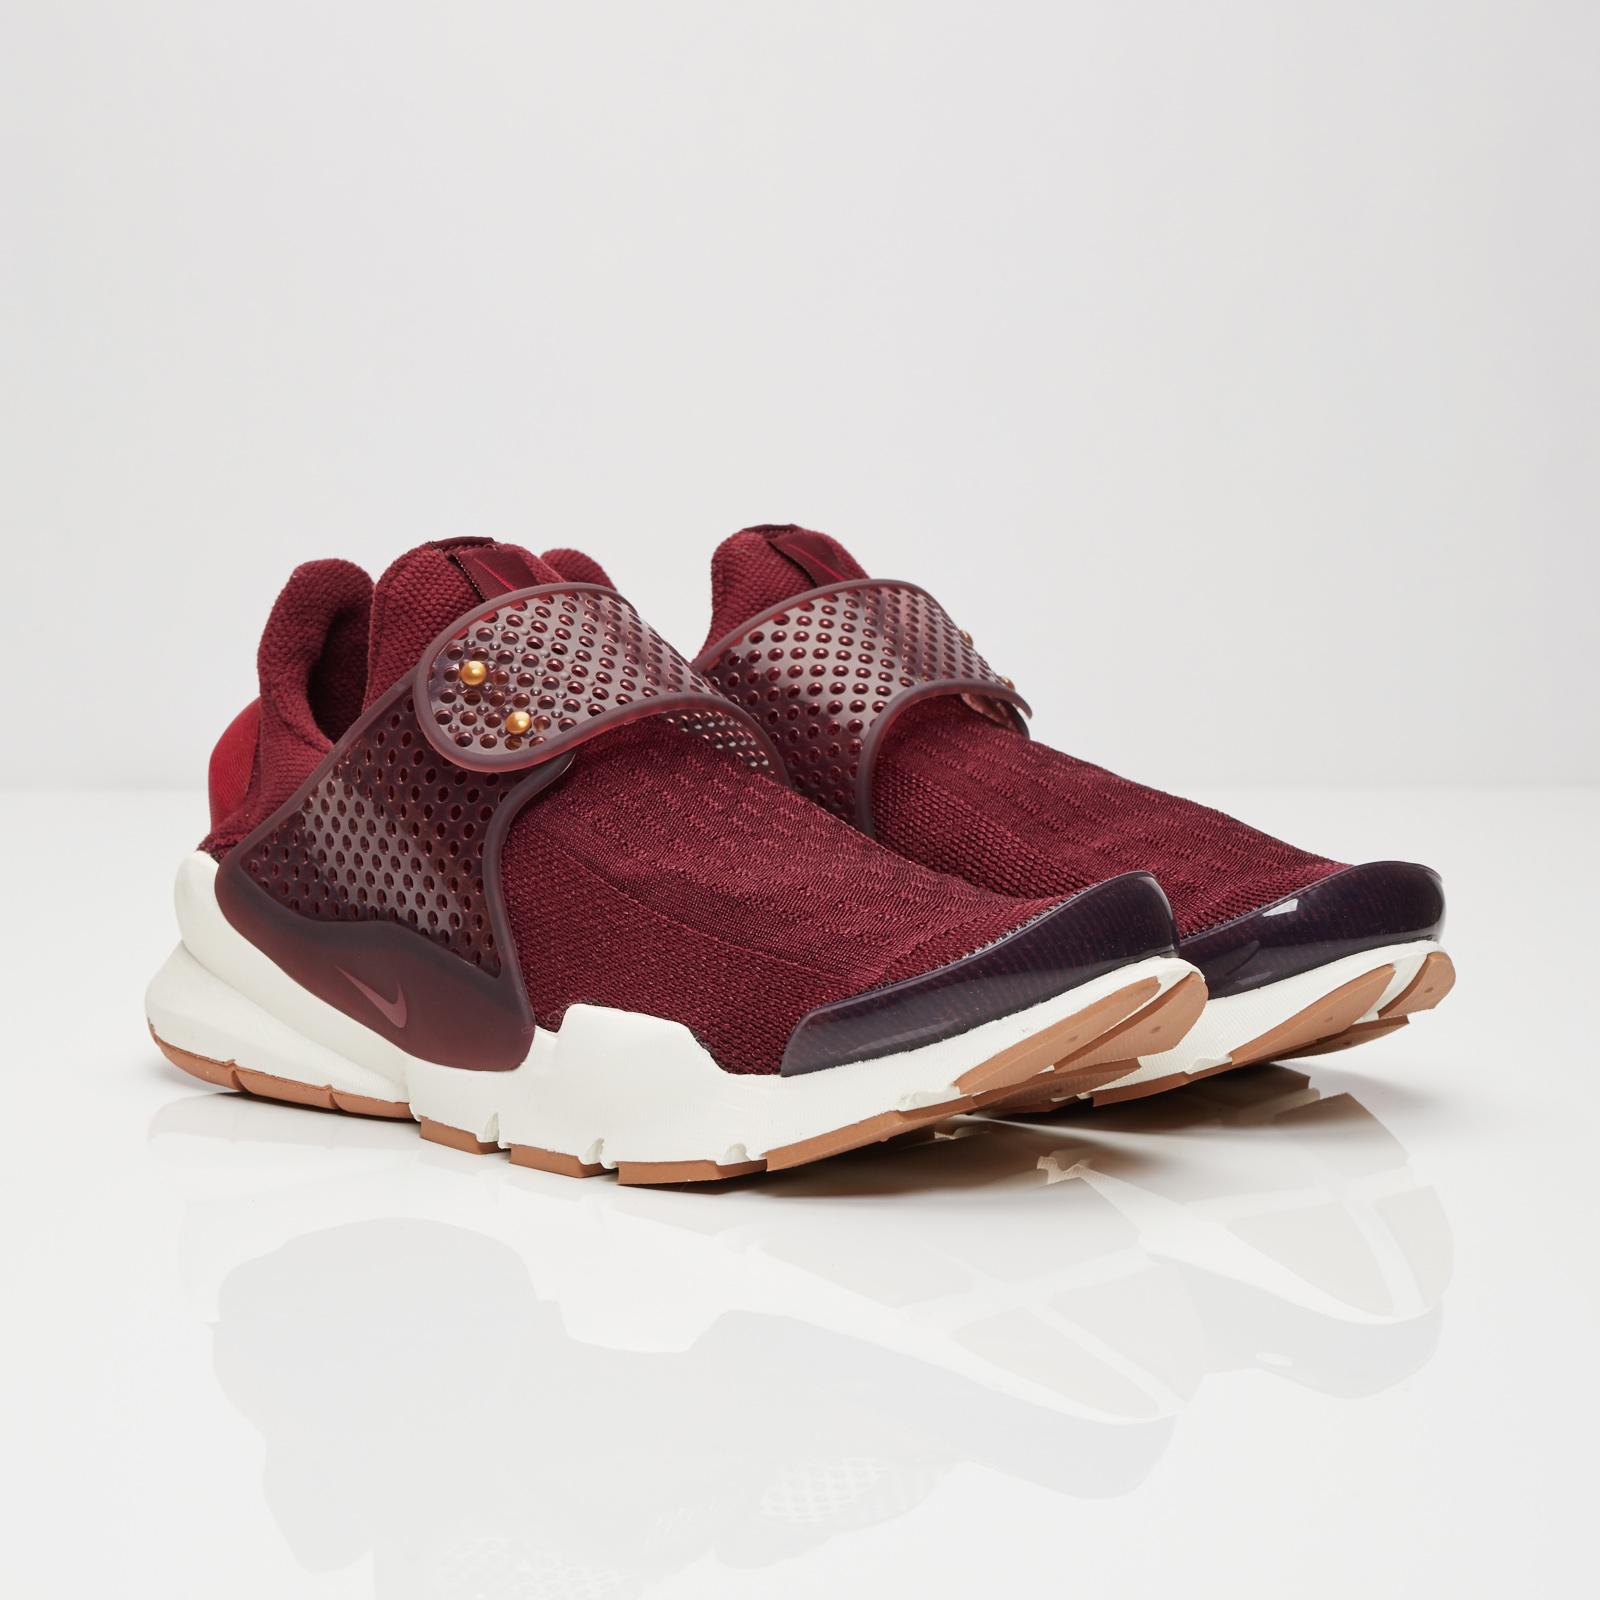 best website a03c3 2db02 Nike Wmns Sock Dart - 848475-600 - Sneakersnstuff | sneakers ...